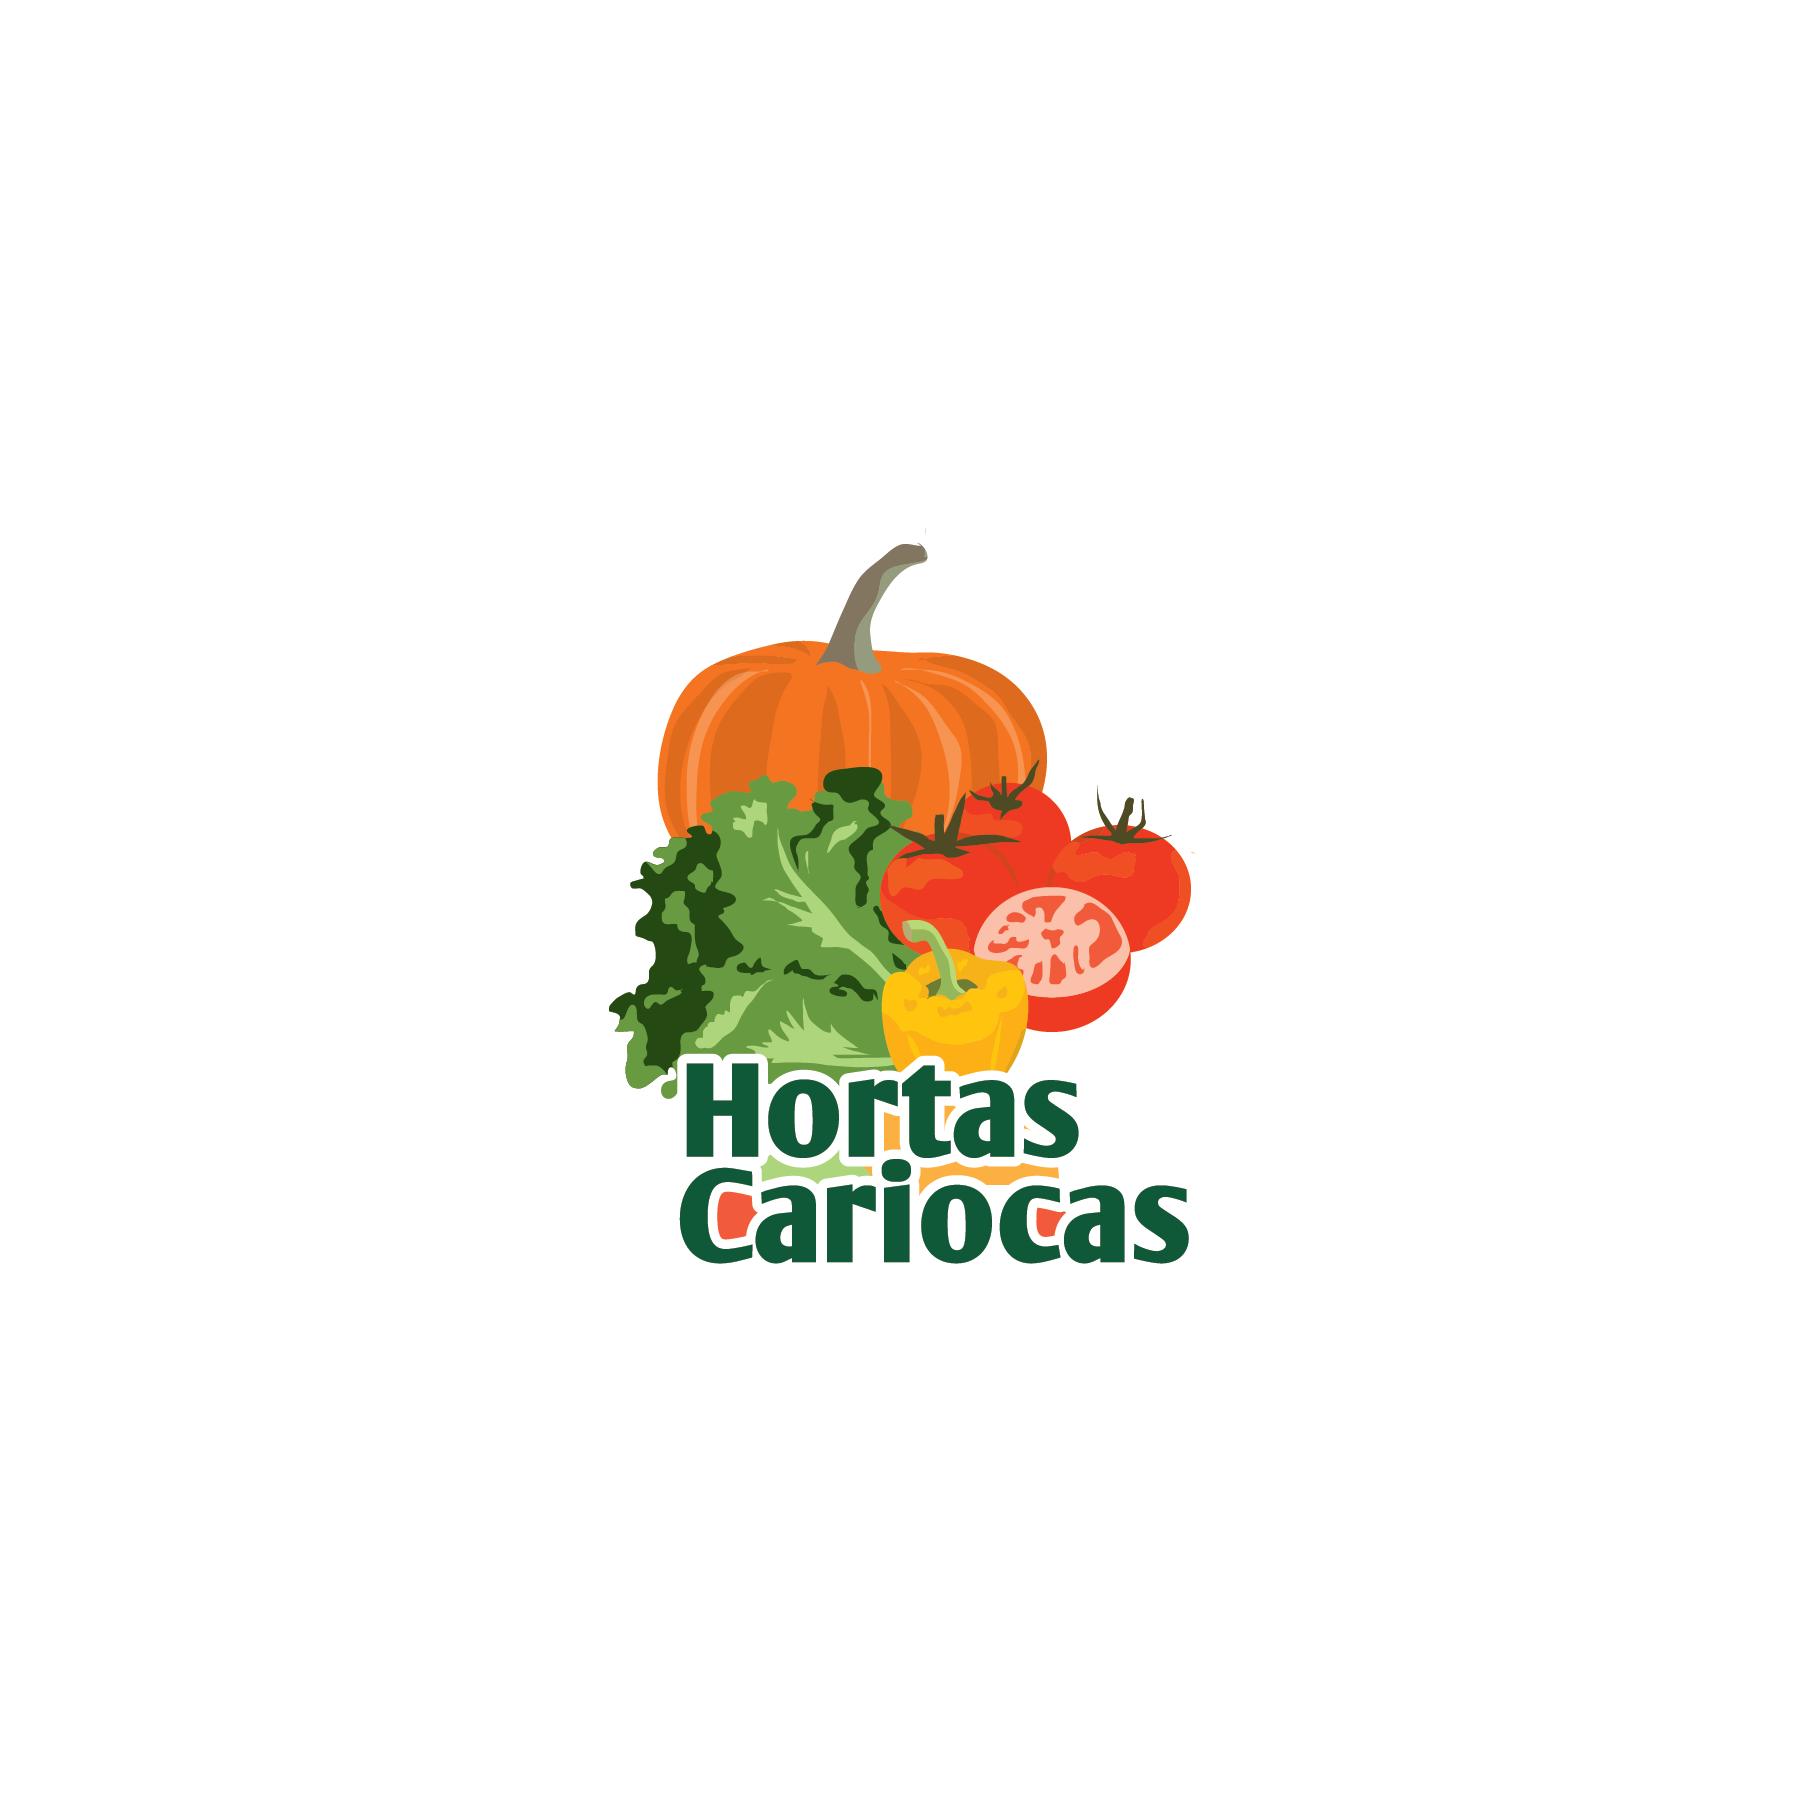 HORTAS CARIOCAS